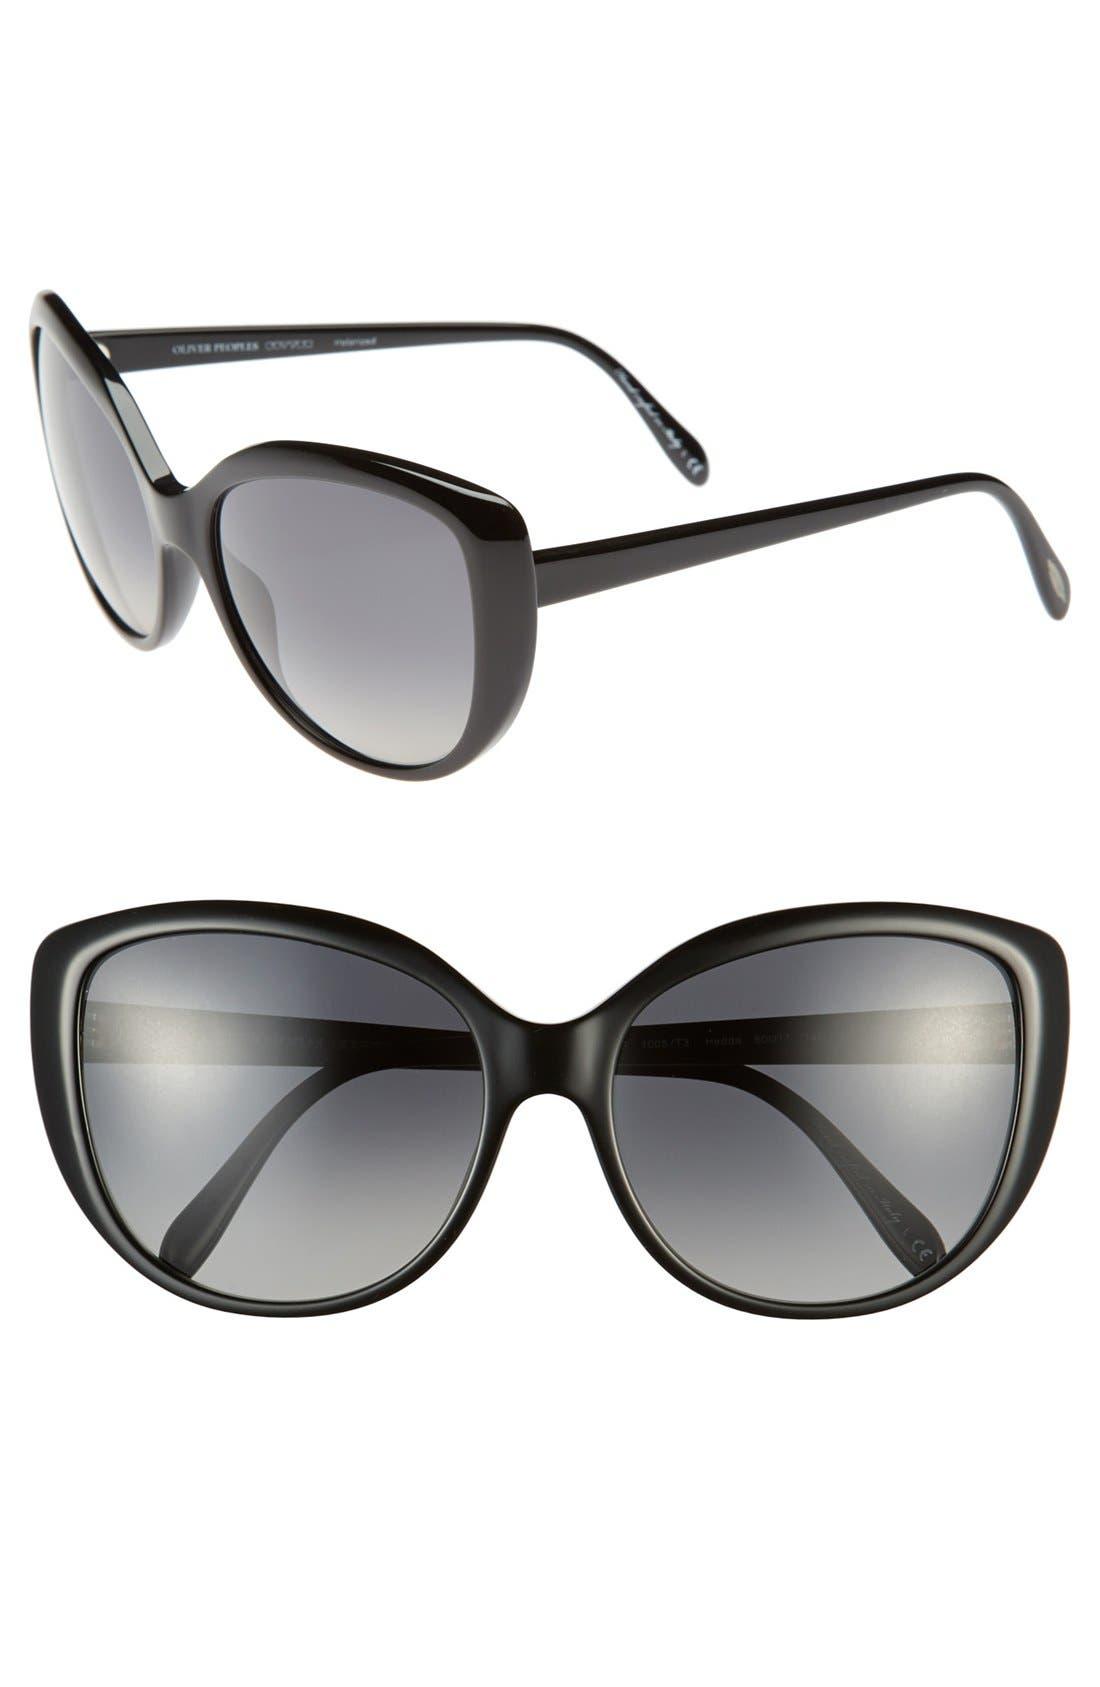 Main Image - Oliver Peoples 'Hedda' 60mm Polarized Sunglasses